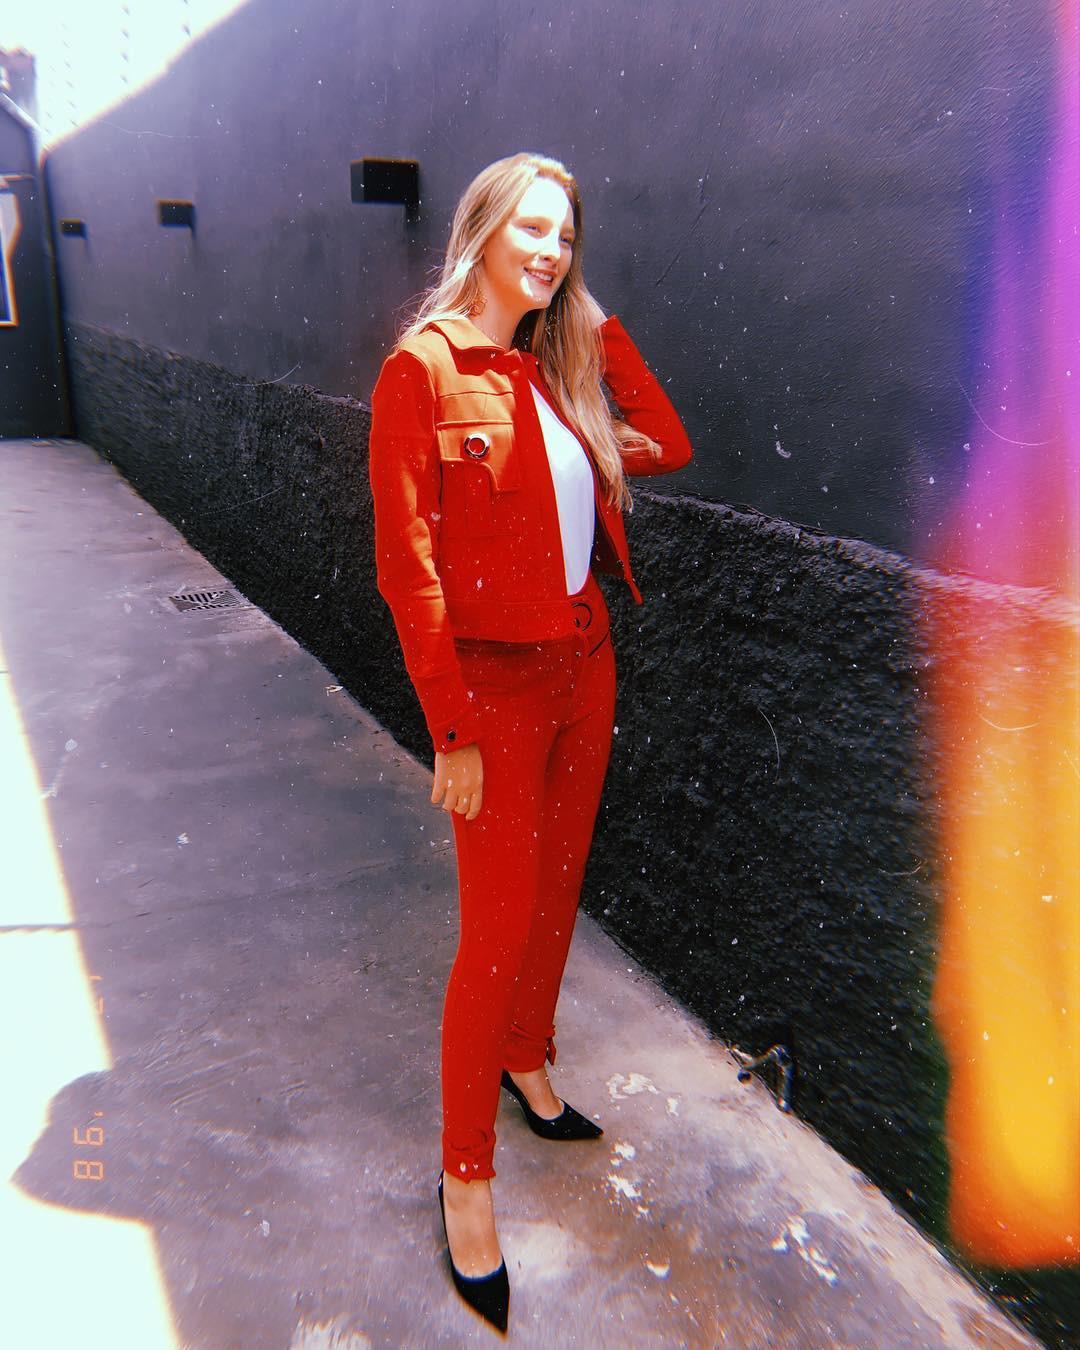 larissa neiverth, top 20 de miss brasil mundo 2019. - Página 3 Qggfog10